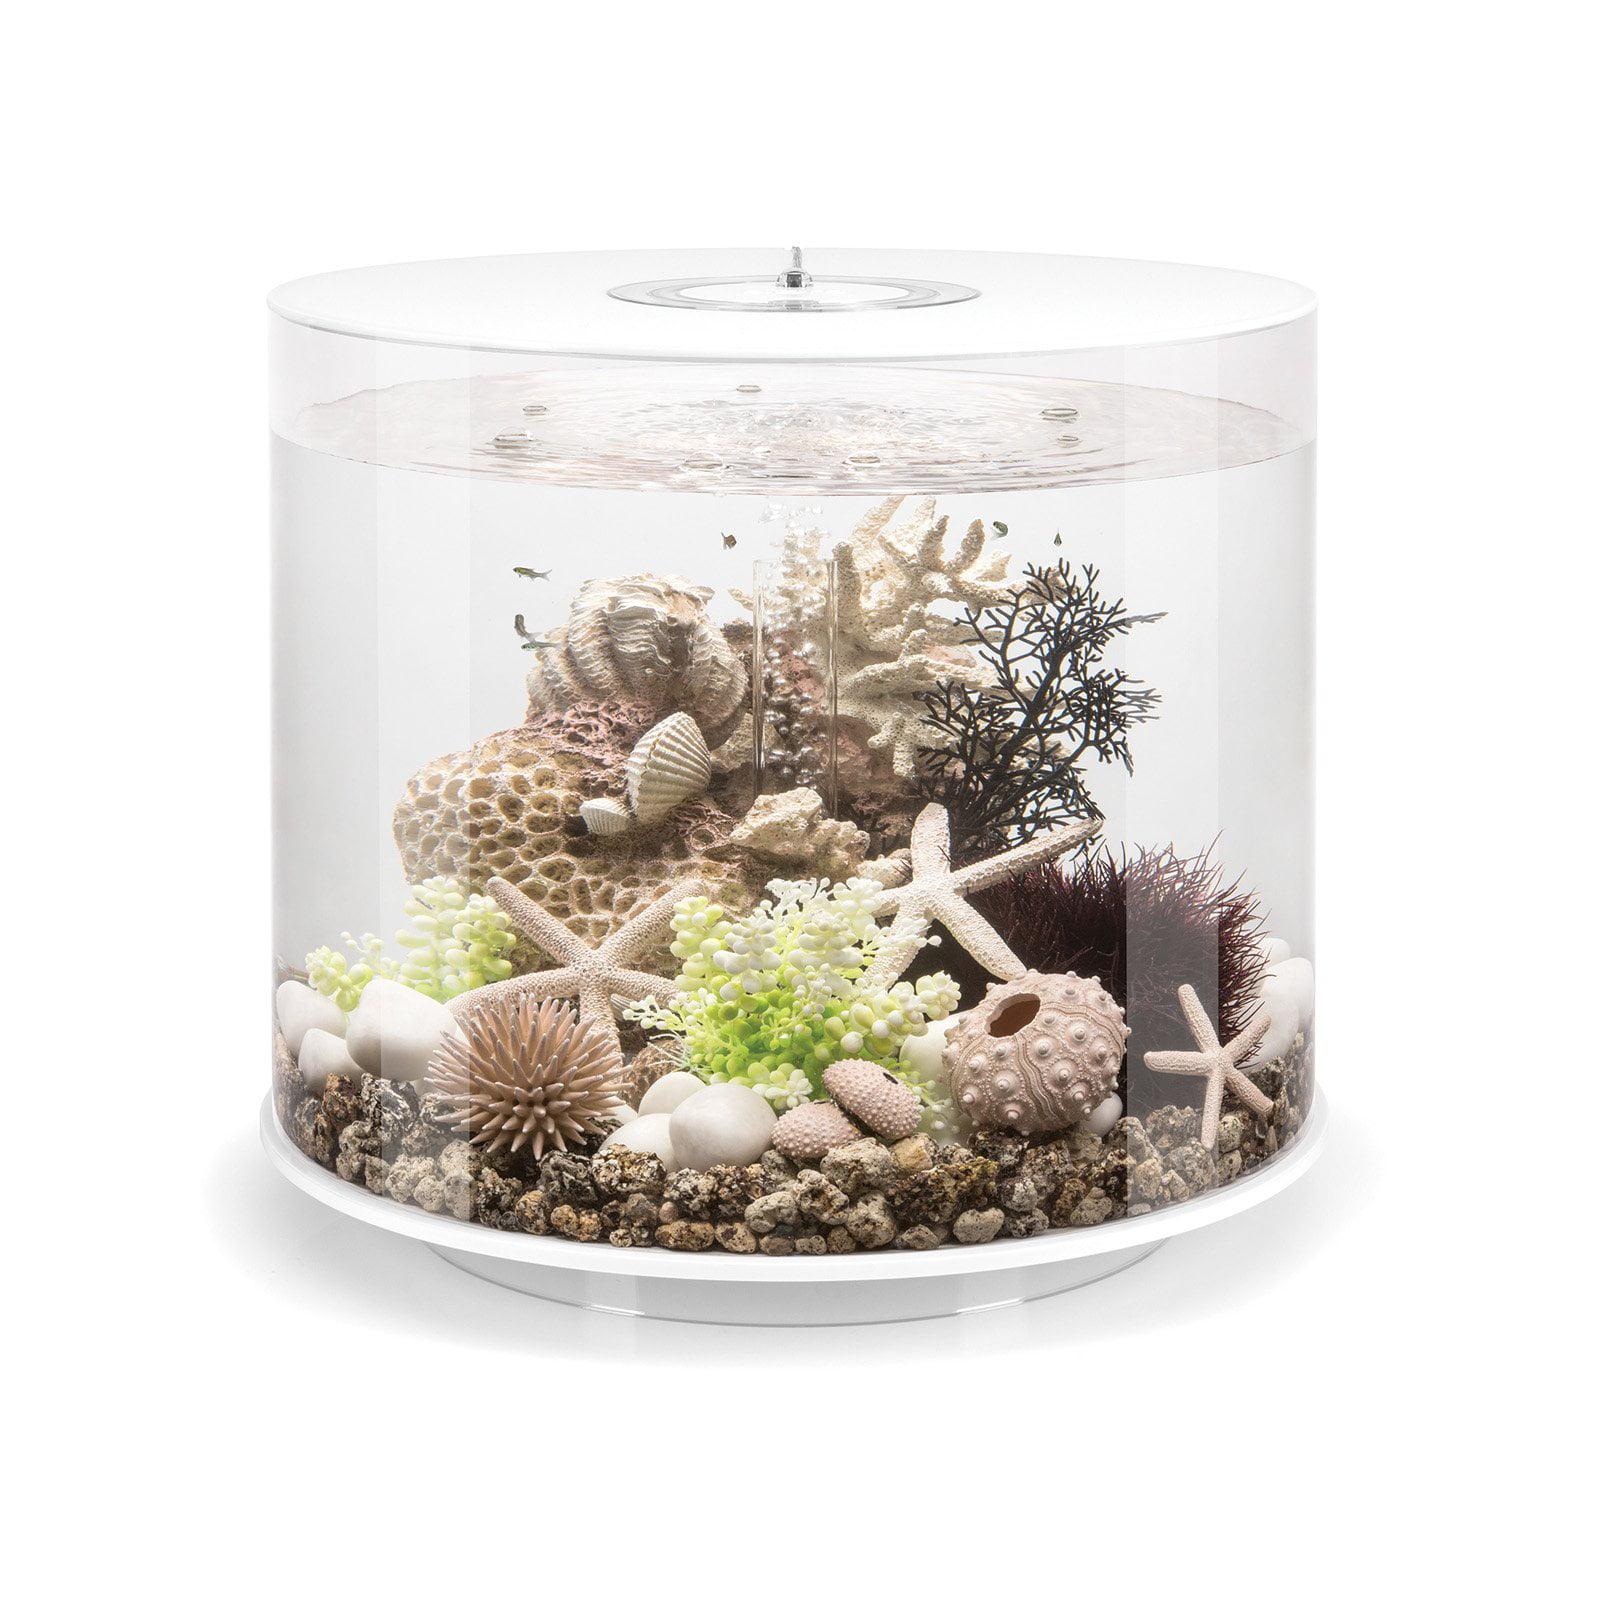 biOrb by Oase Tube 35 MCR Aquarium